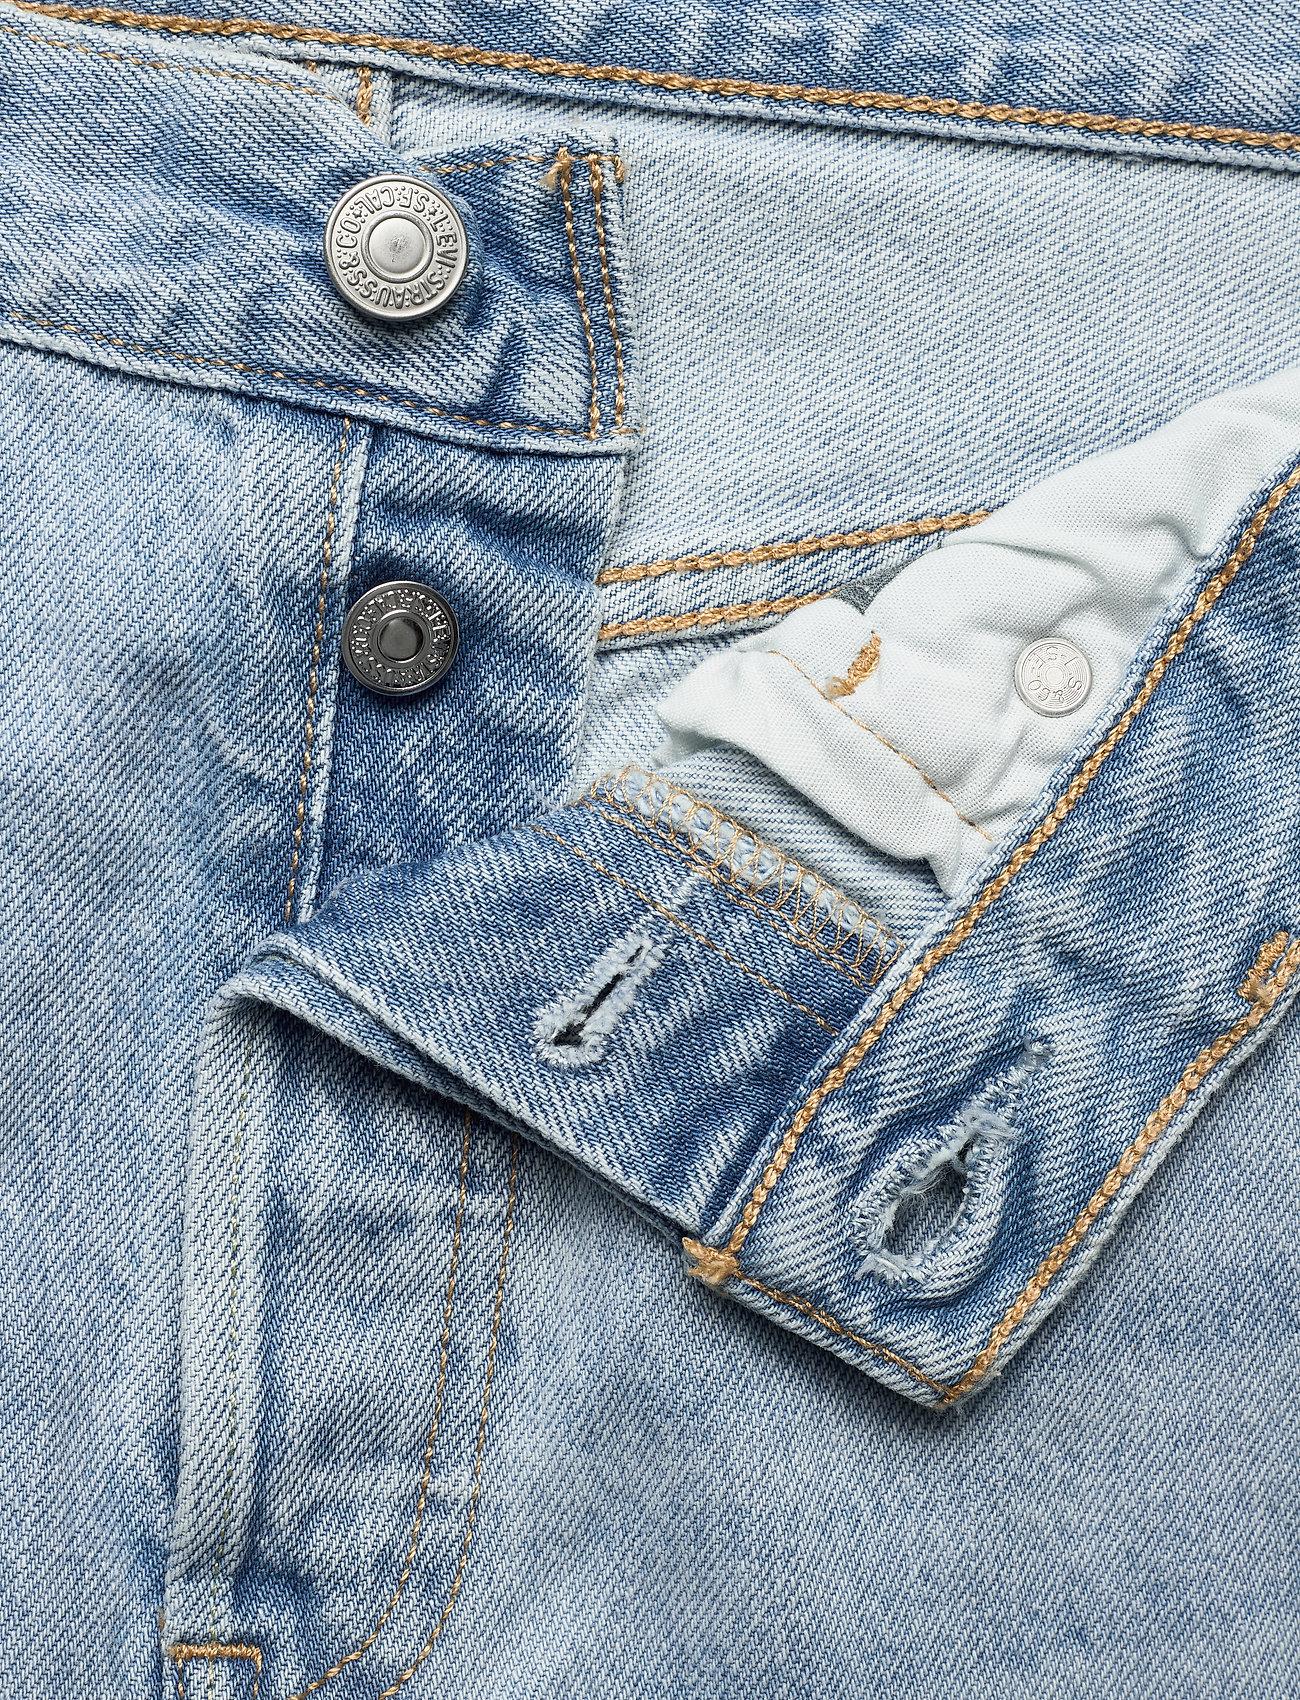 LEVI´S Women - 501 CROP OJAI LUXOR RA - straight regular - light indigo - worn in - 3